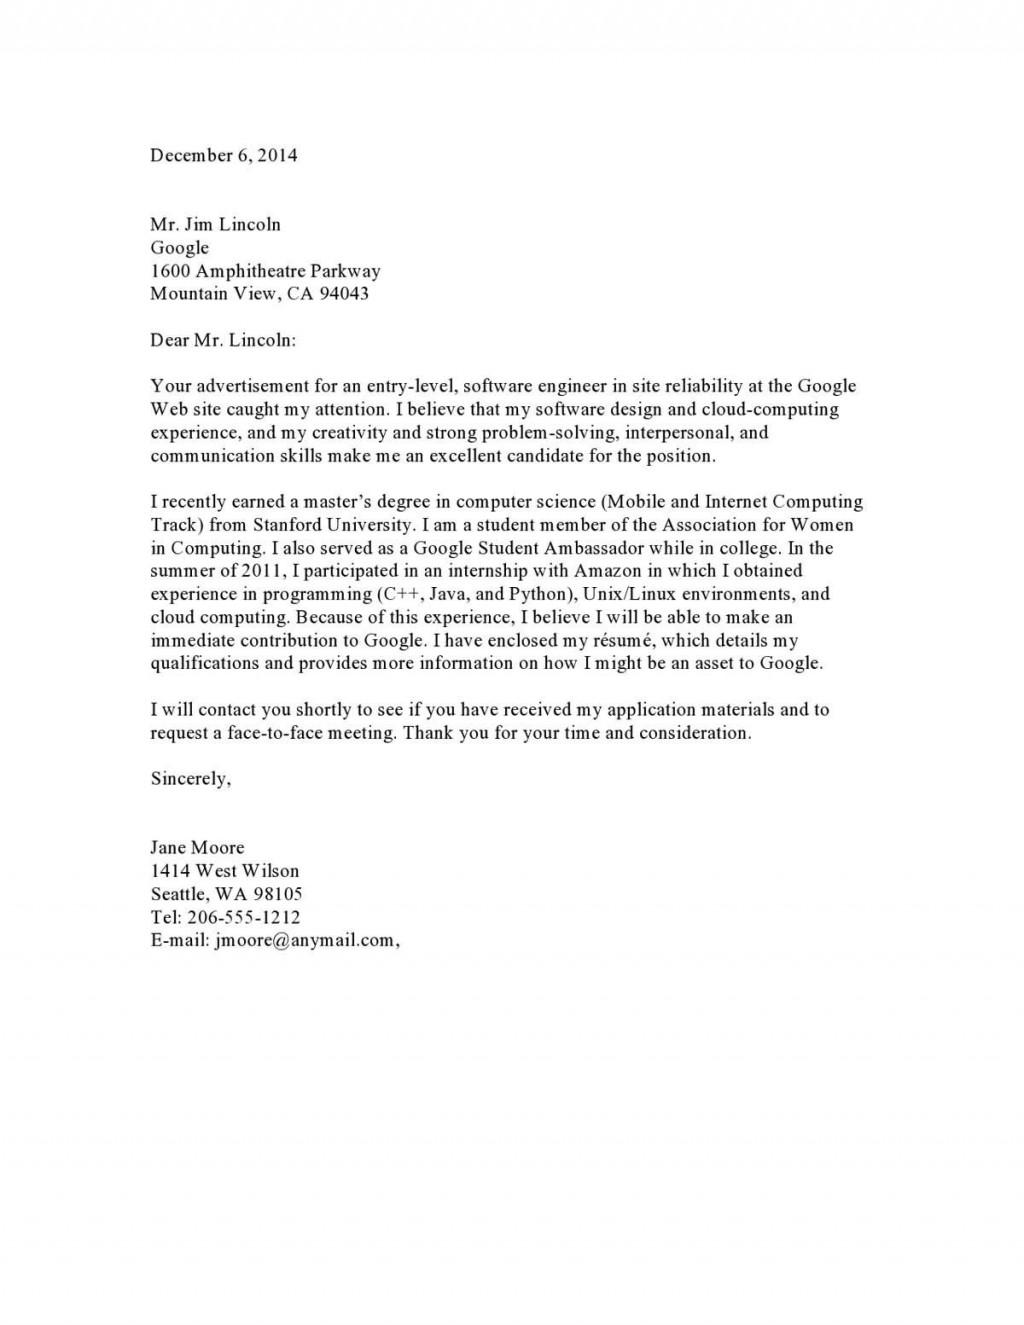 004 Unique Basic Covering Letter Template Concept  Simple Application Job Sample CoverLarge